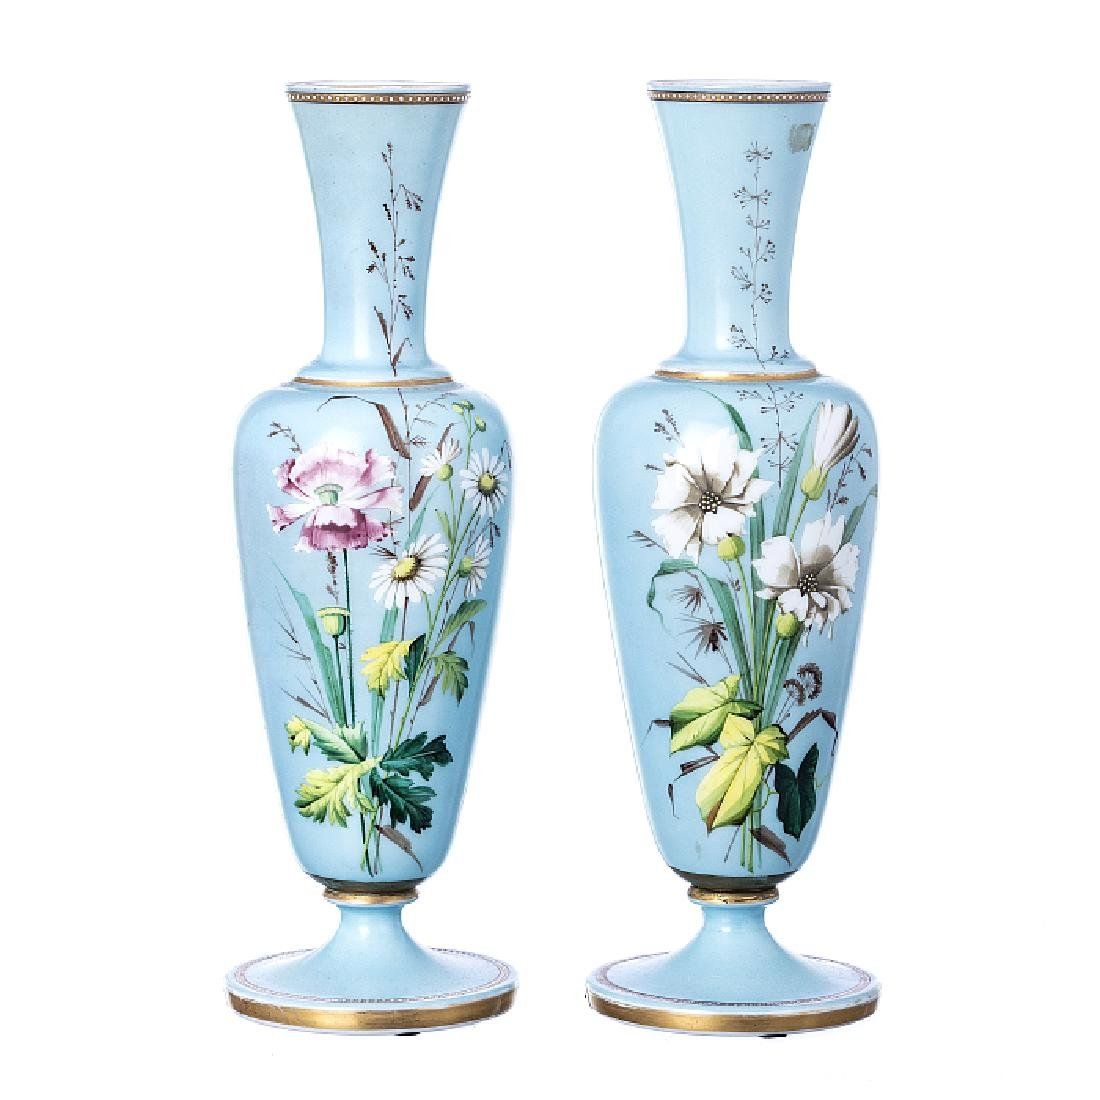 Pair of jugs in opaline glass